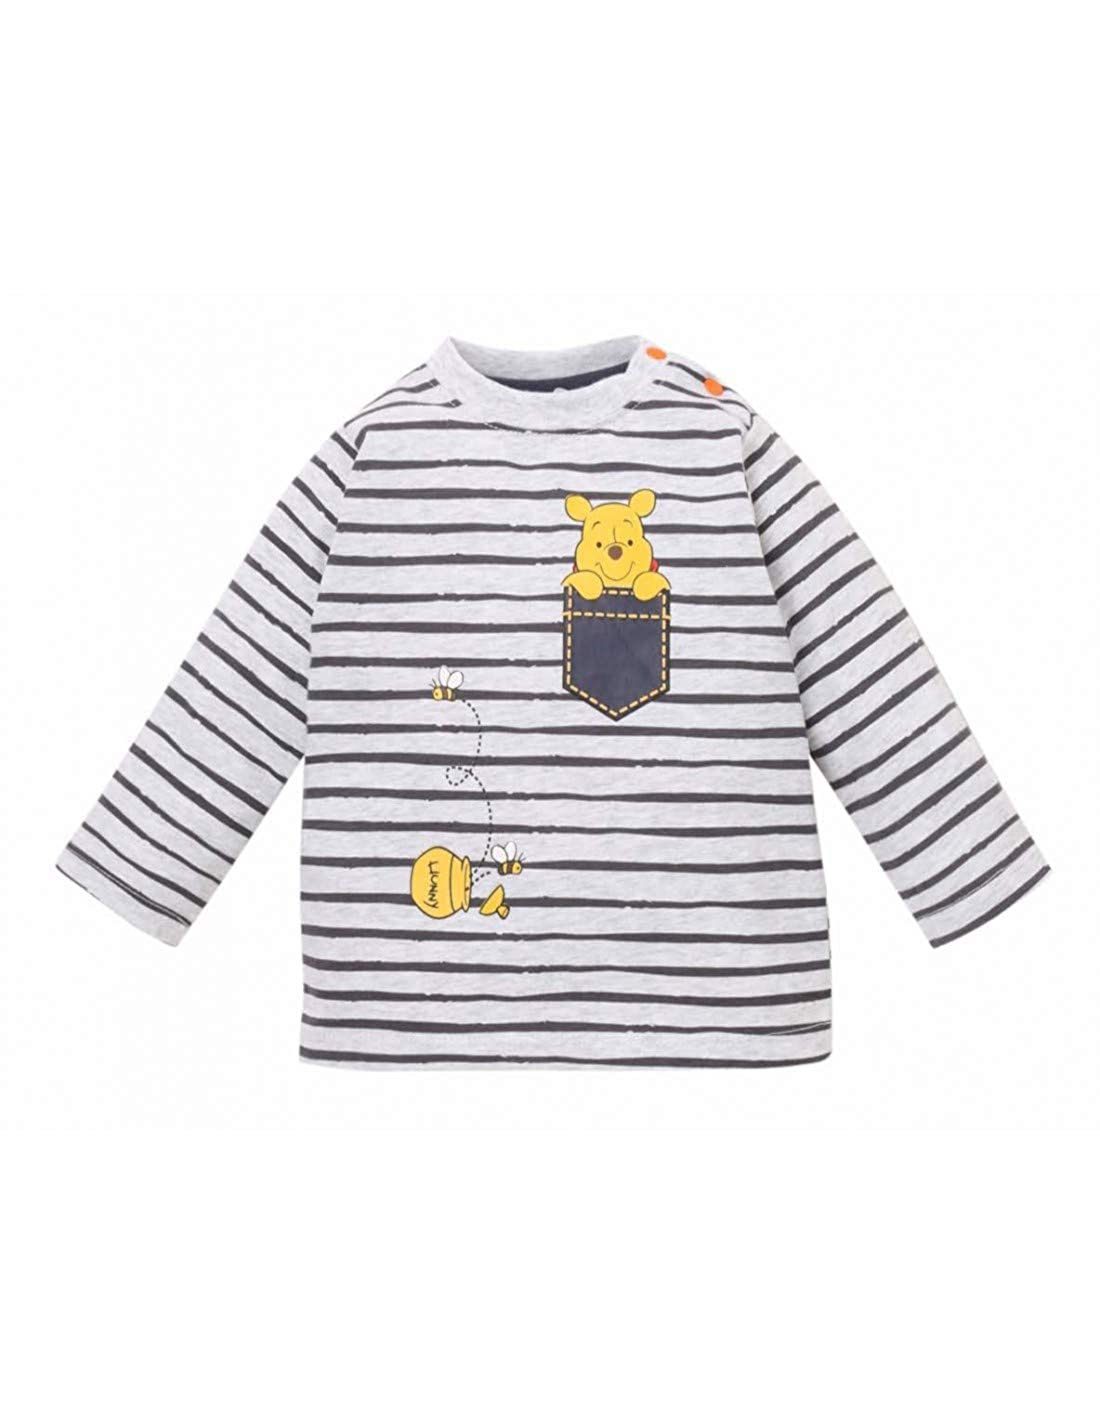 Winnie l'ourson Baby Boys' Long Sleeve Tee Winnie L' ourson TSML-B-WIN-SO5683-1050M